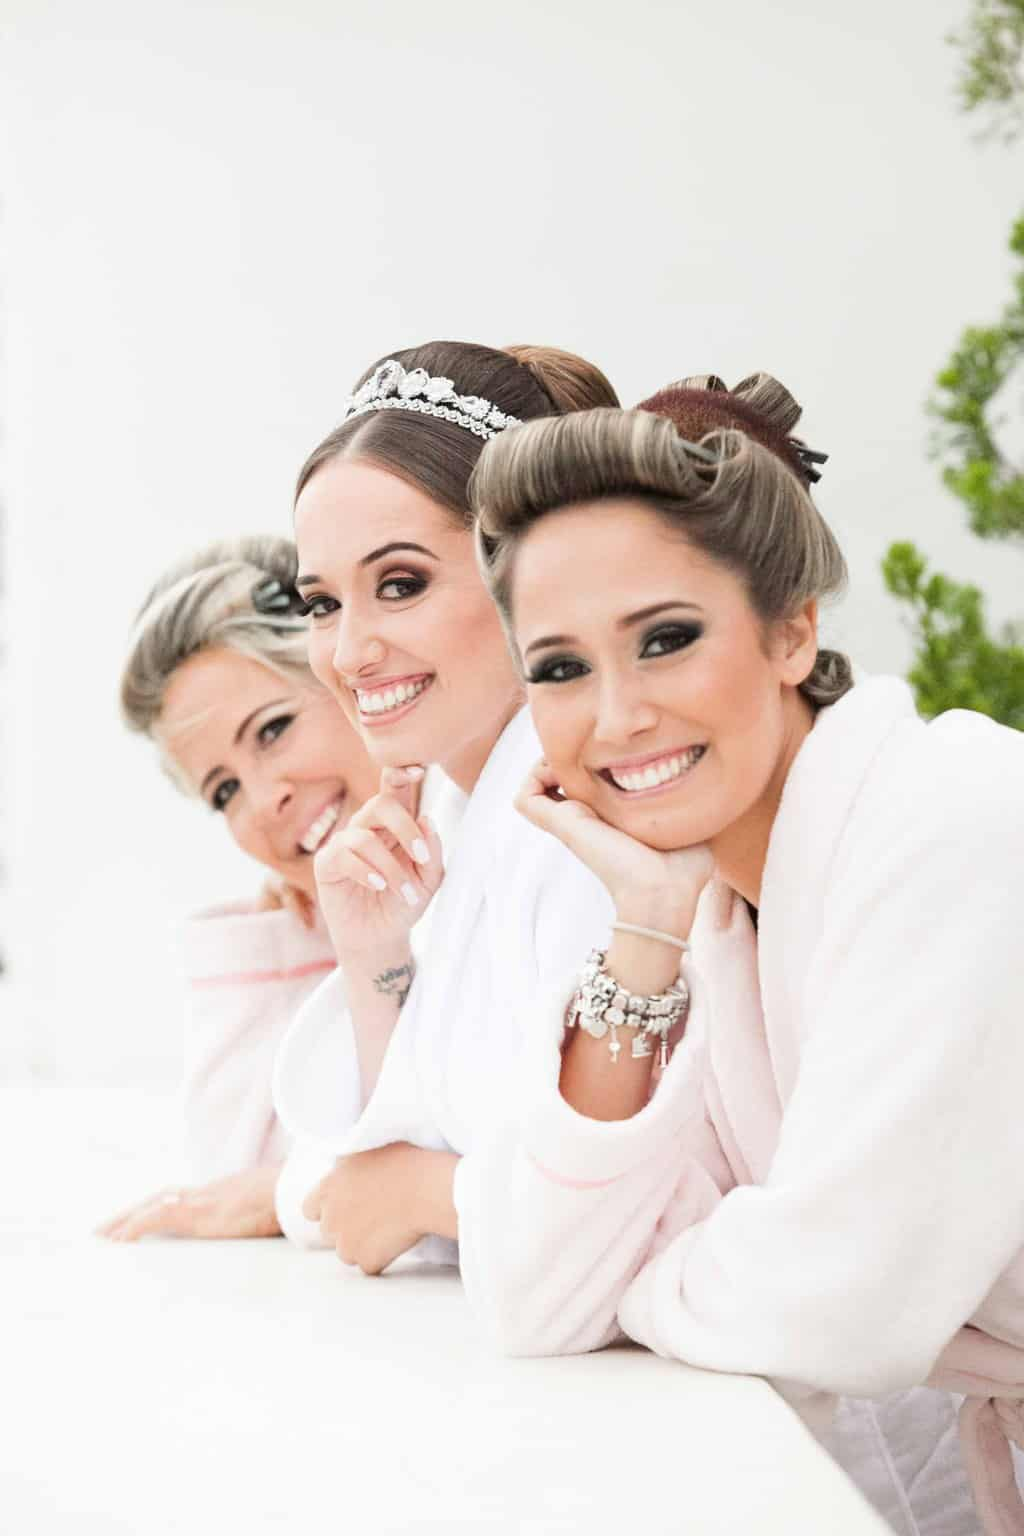 Casamento-Clássico-Casamento-tradicional-Copacabana-Palace-Making-of-Monica-Roias-Ribas-Foto-e-Vídeo-Sapato-Tuanny-e-Bernardo-CaseMe-2